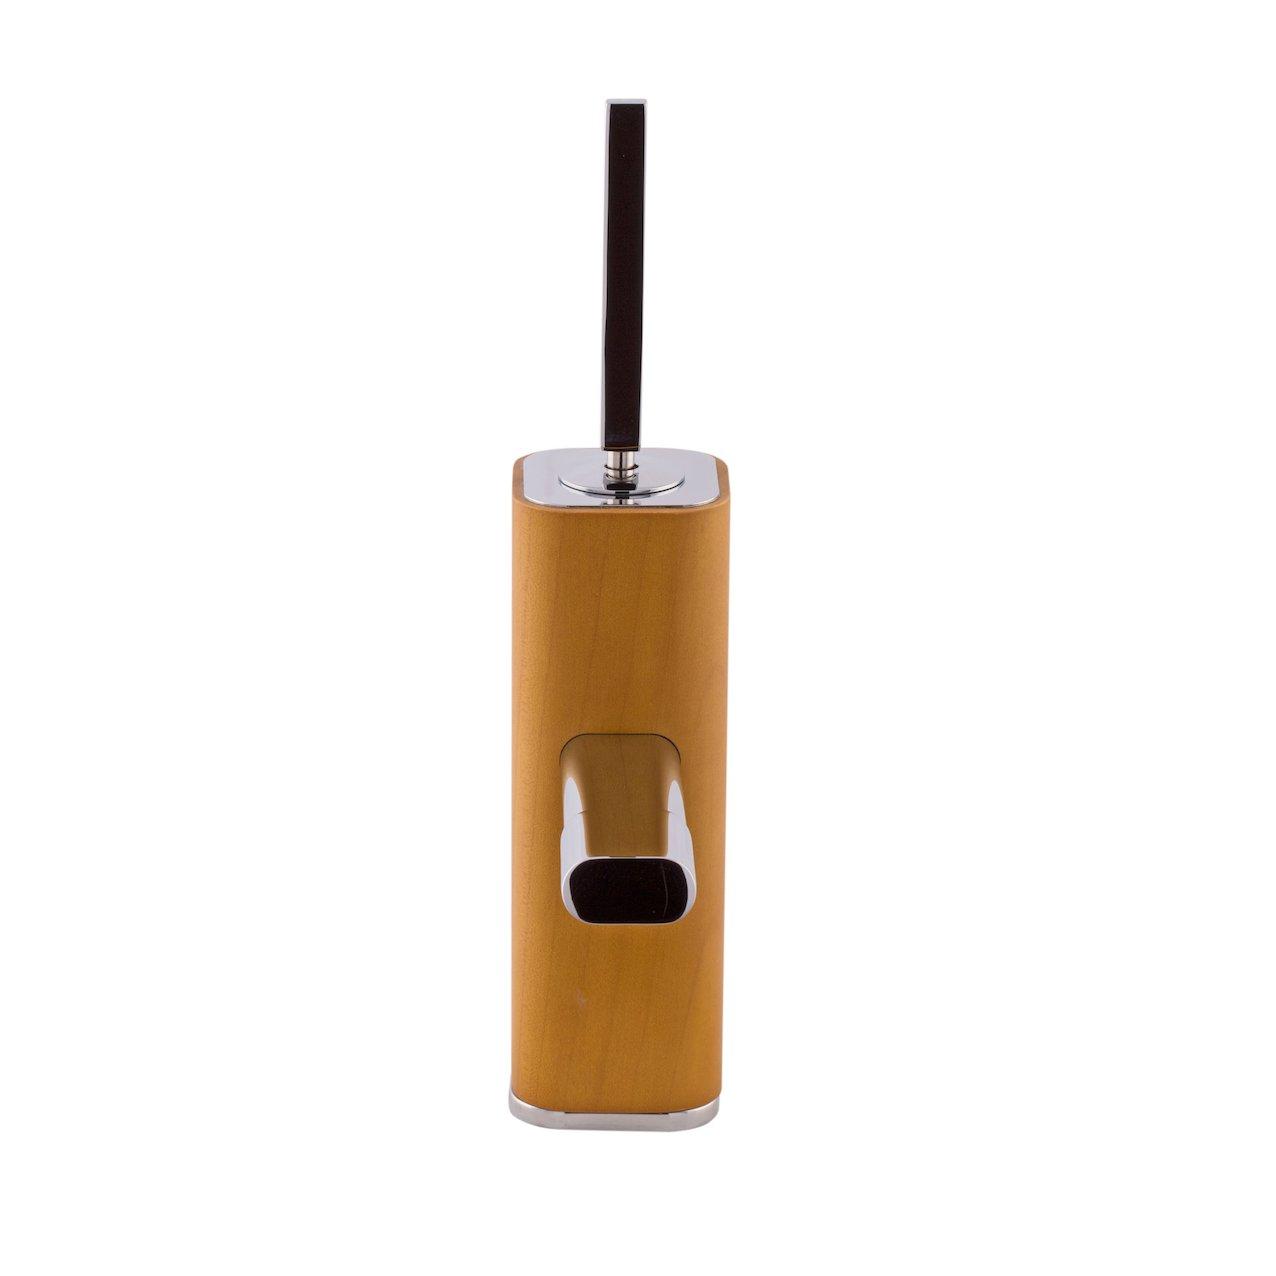 Washbasin mixer Seve Straw Wood - 360 - 0